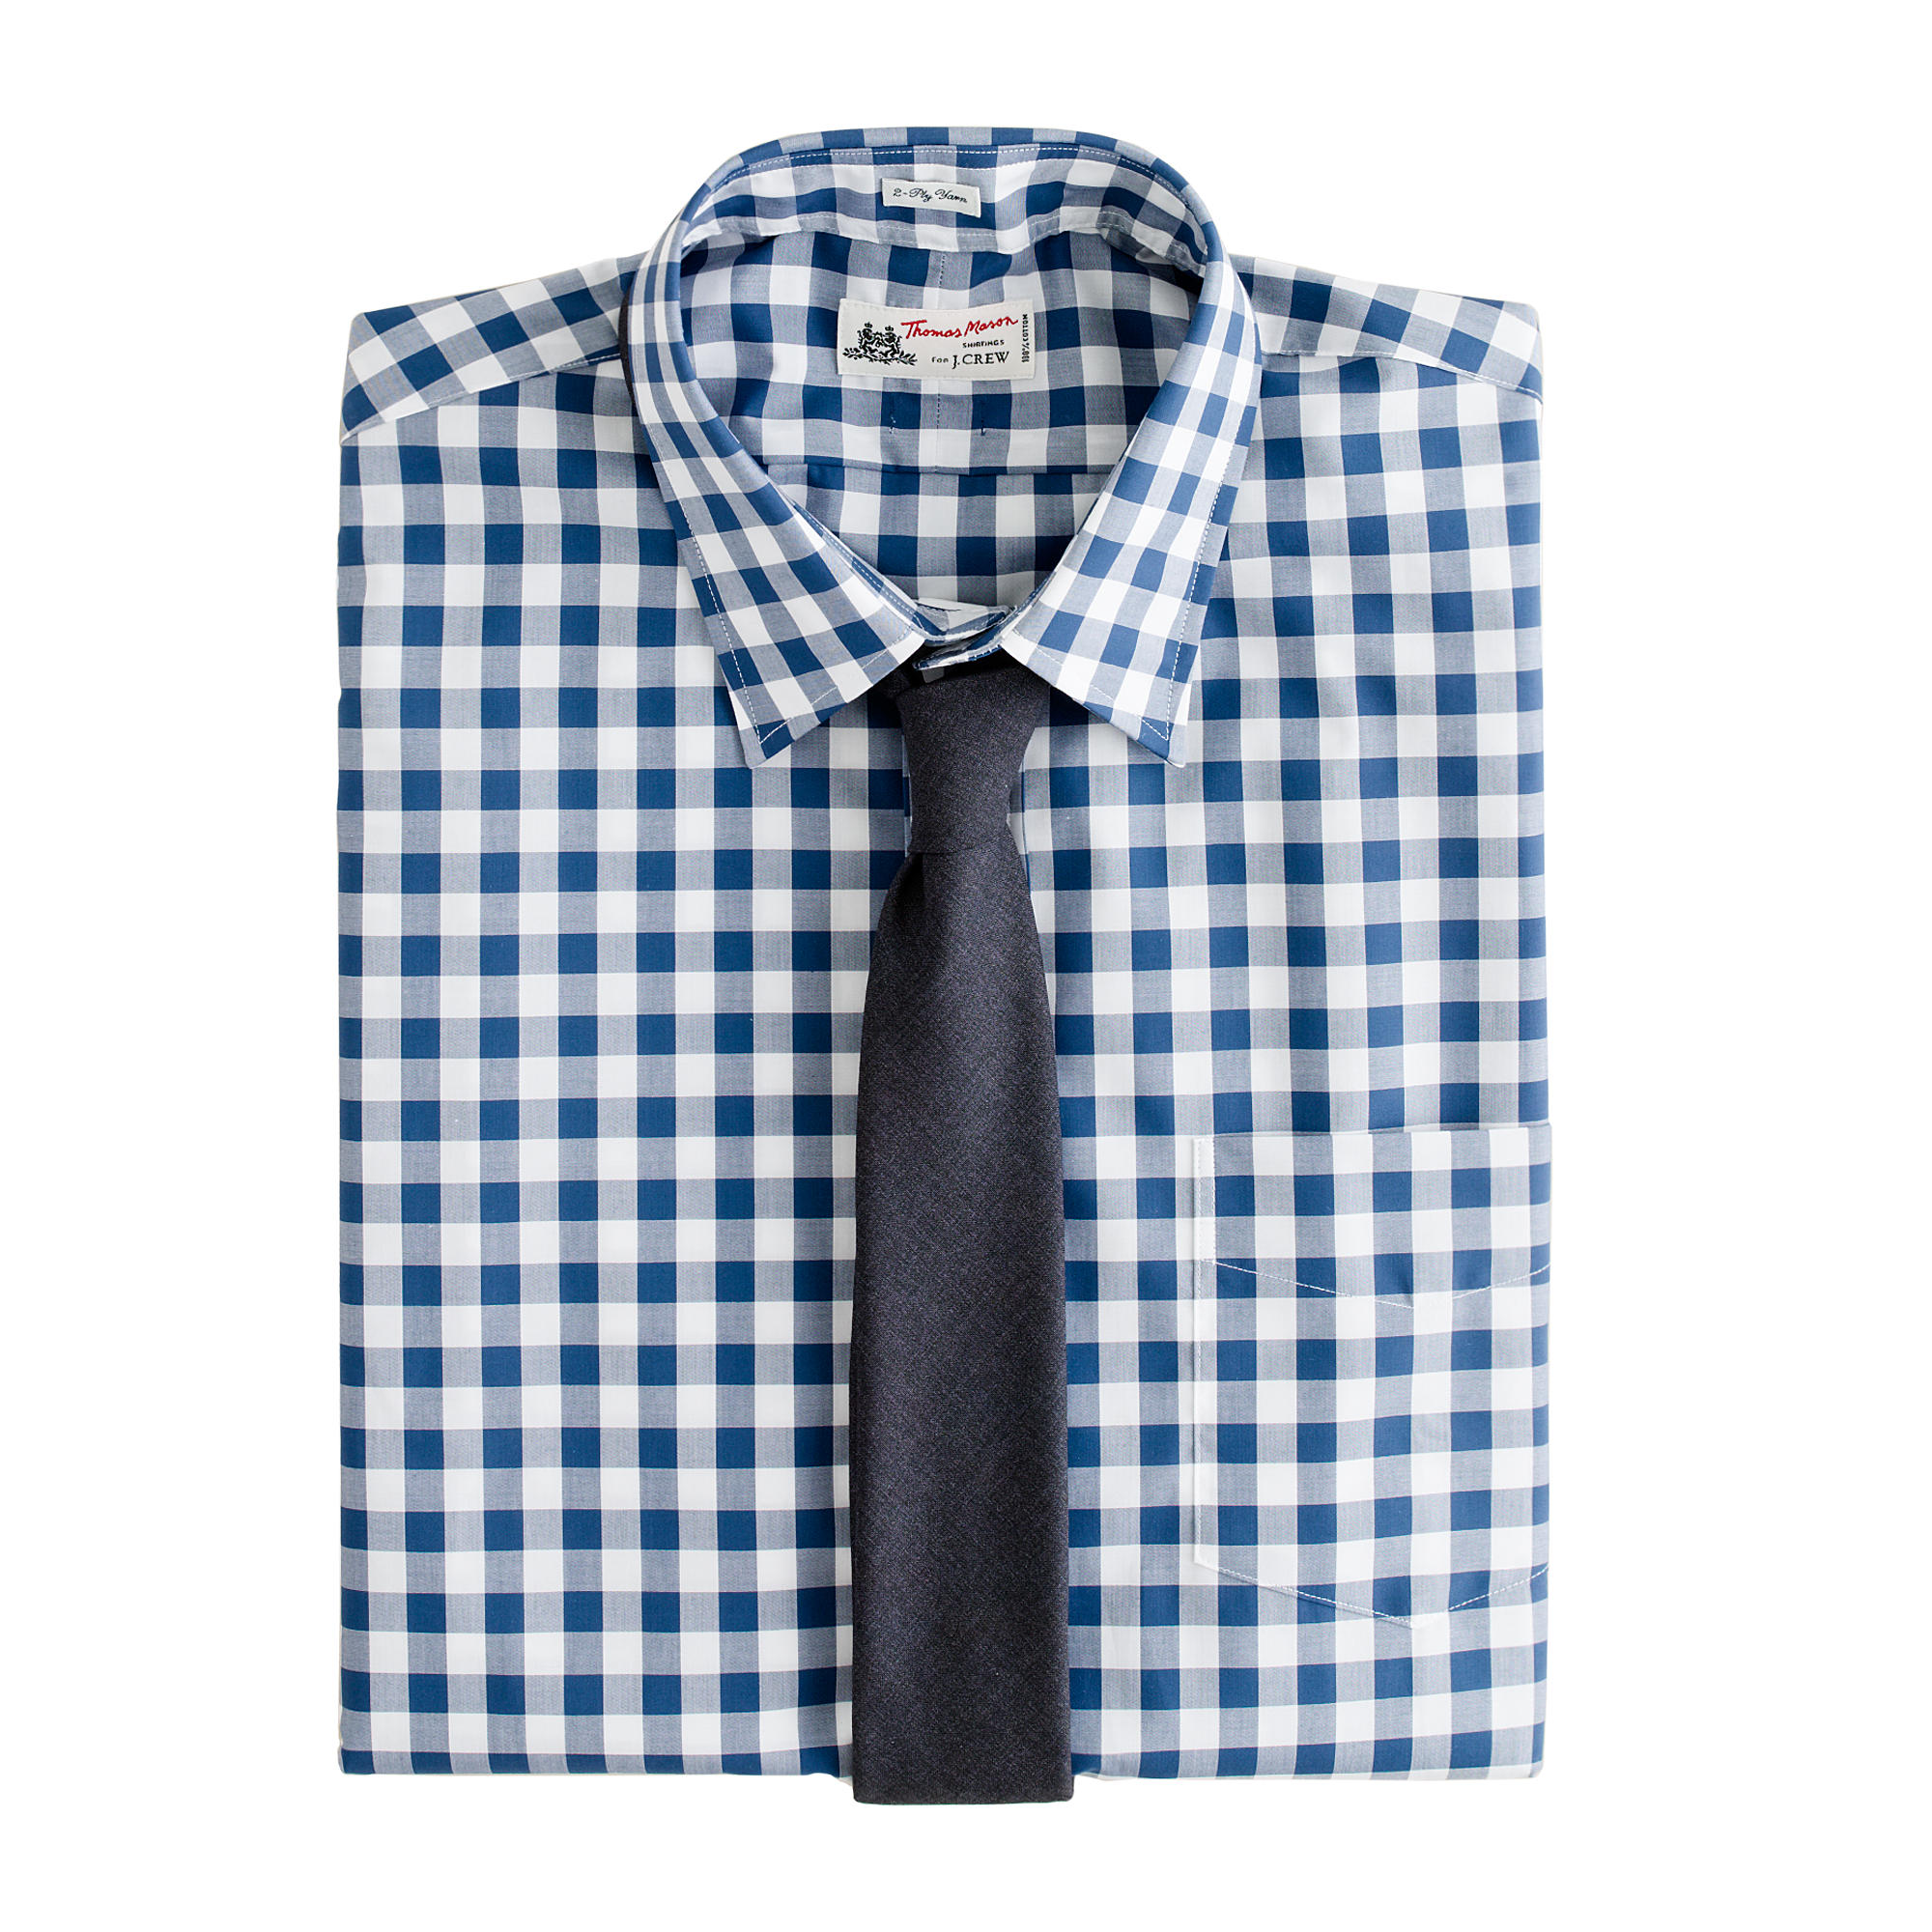 Thomas mason for j crew point collar dress shirt in for Thomas mason dress shirts